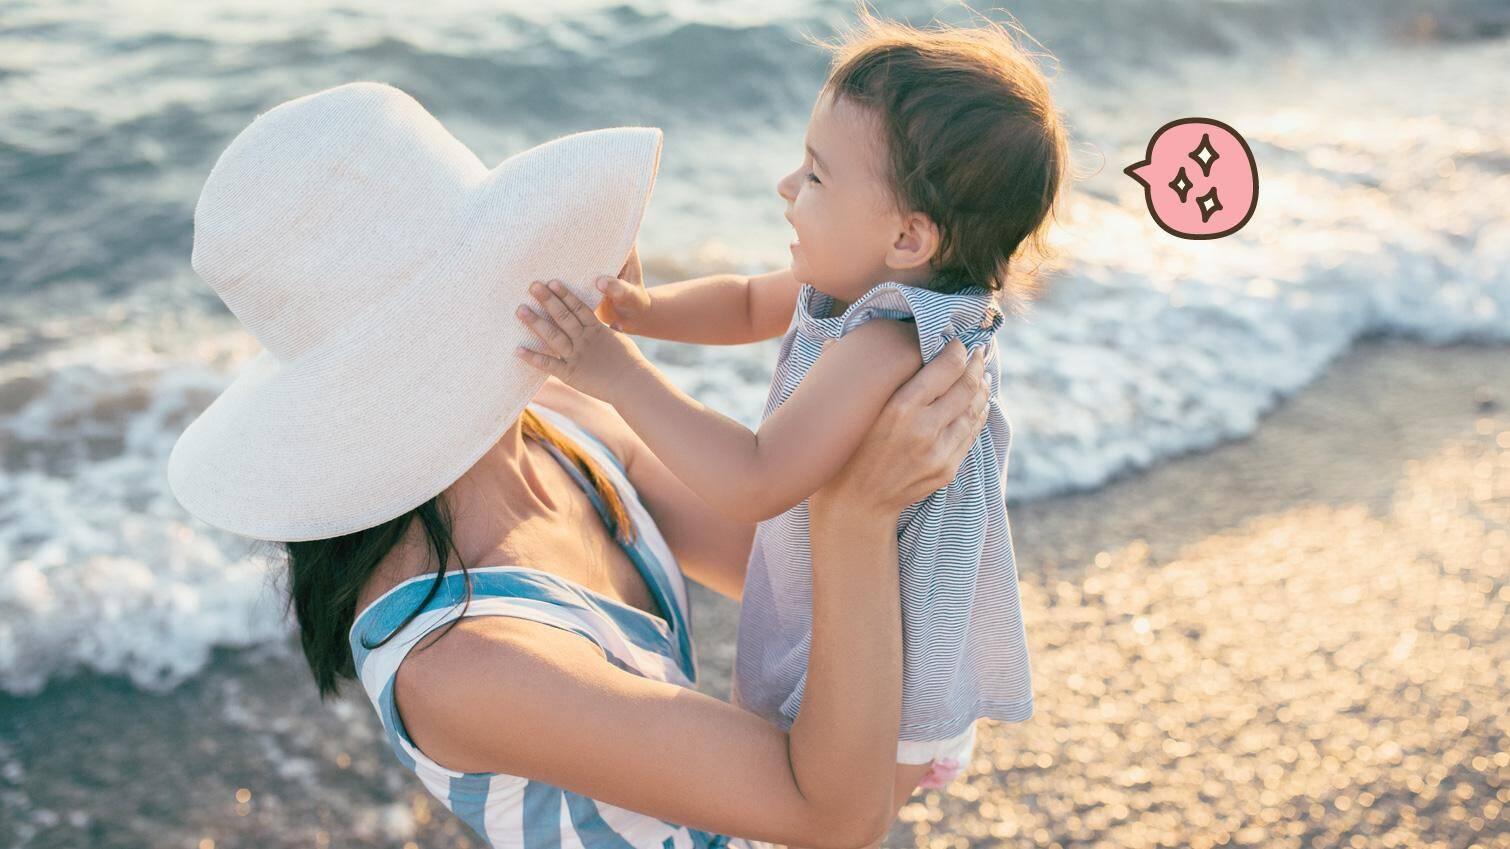 Ini 8 Tips Memilih Destinasi Wisata Ramah Bayi